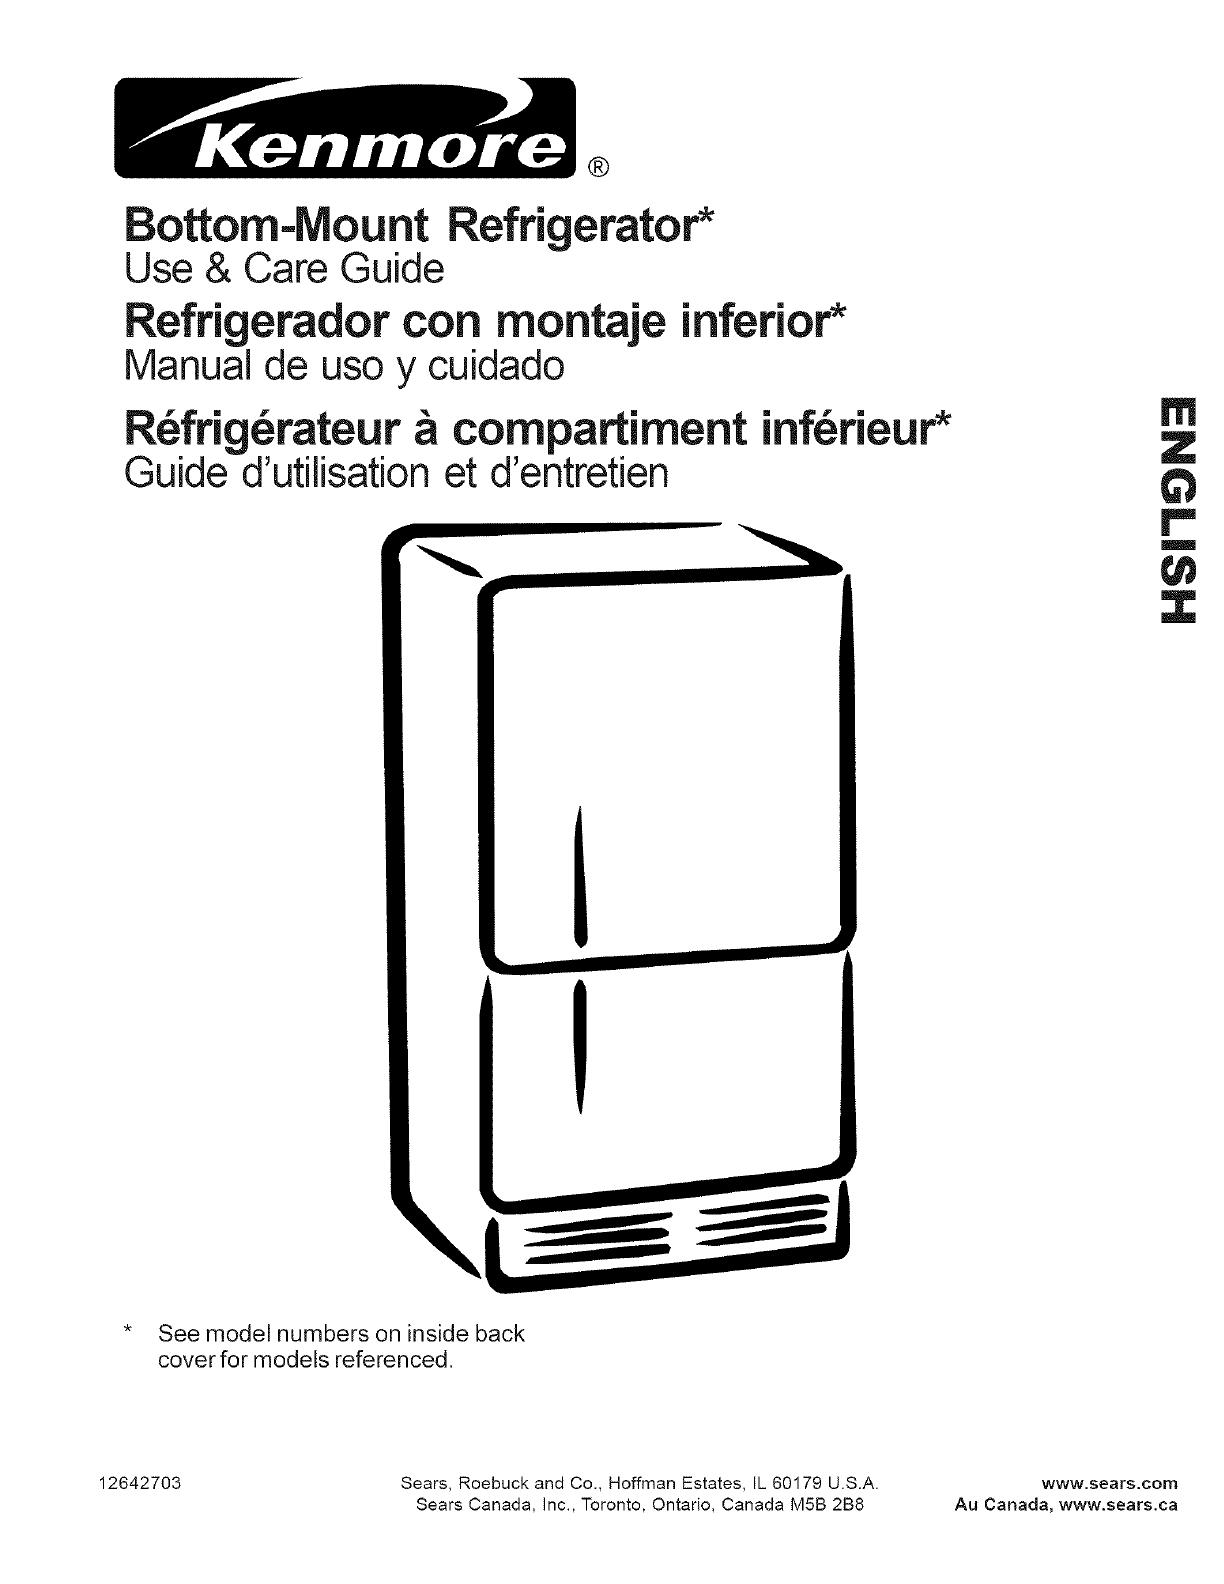 Kenmore 59662232200 User Manual Refrigerator Manuals And Guides L0703106 Conception De Circuits Imprims Bottom Mount